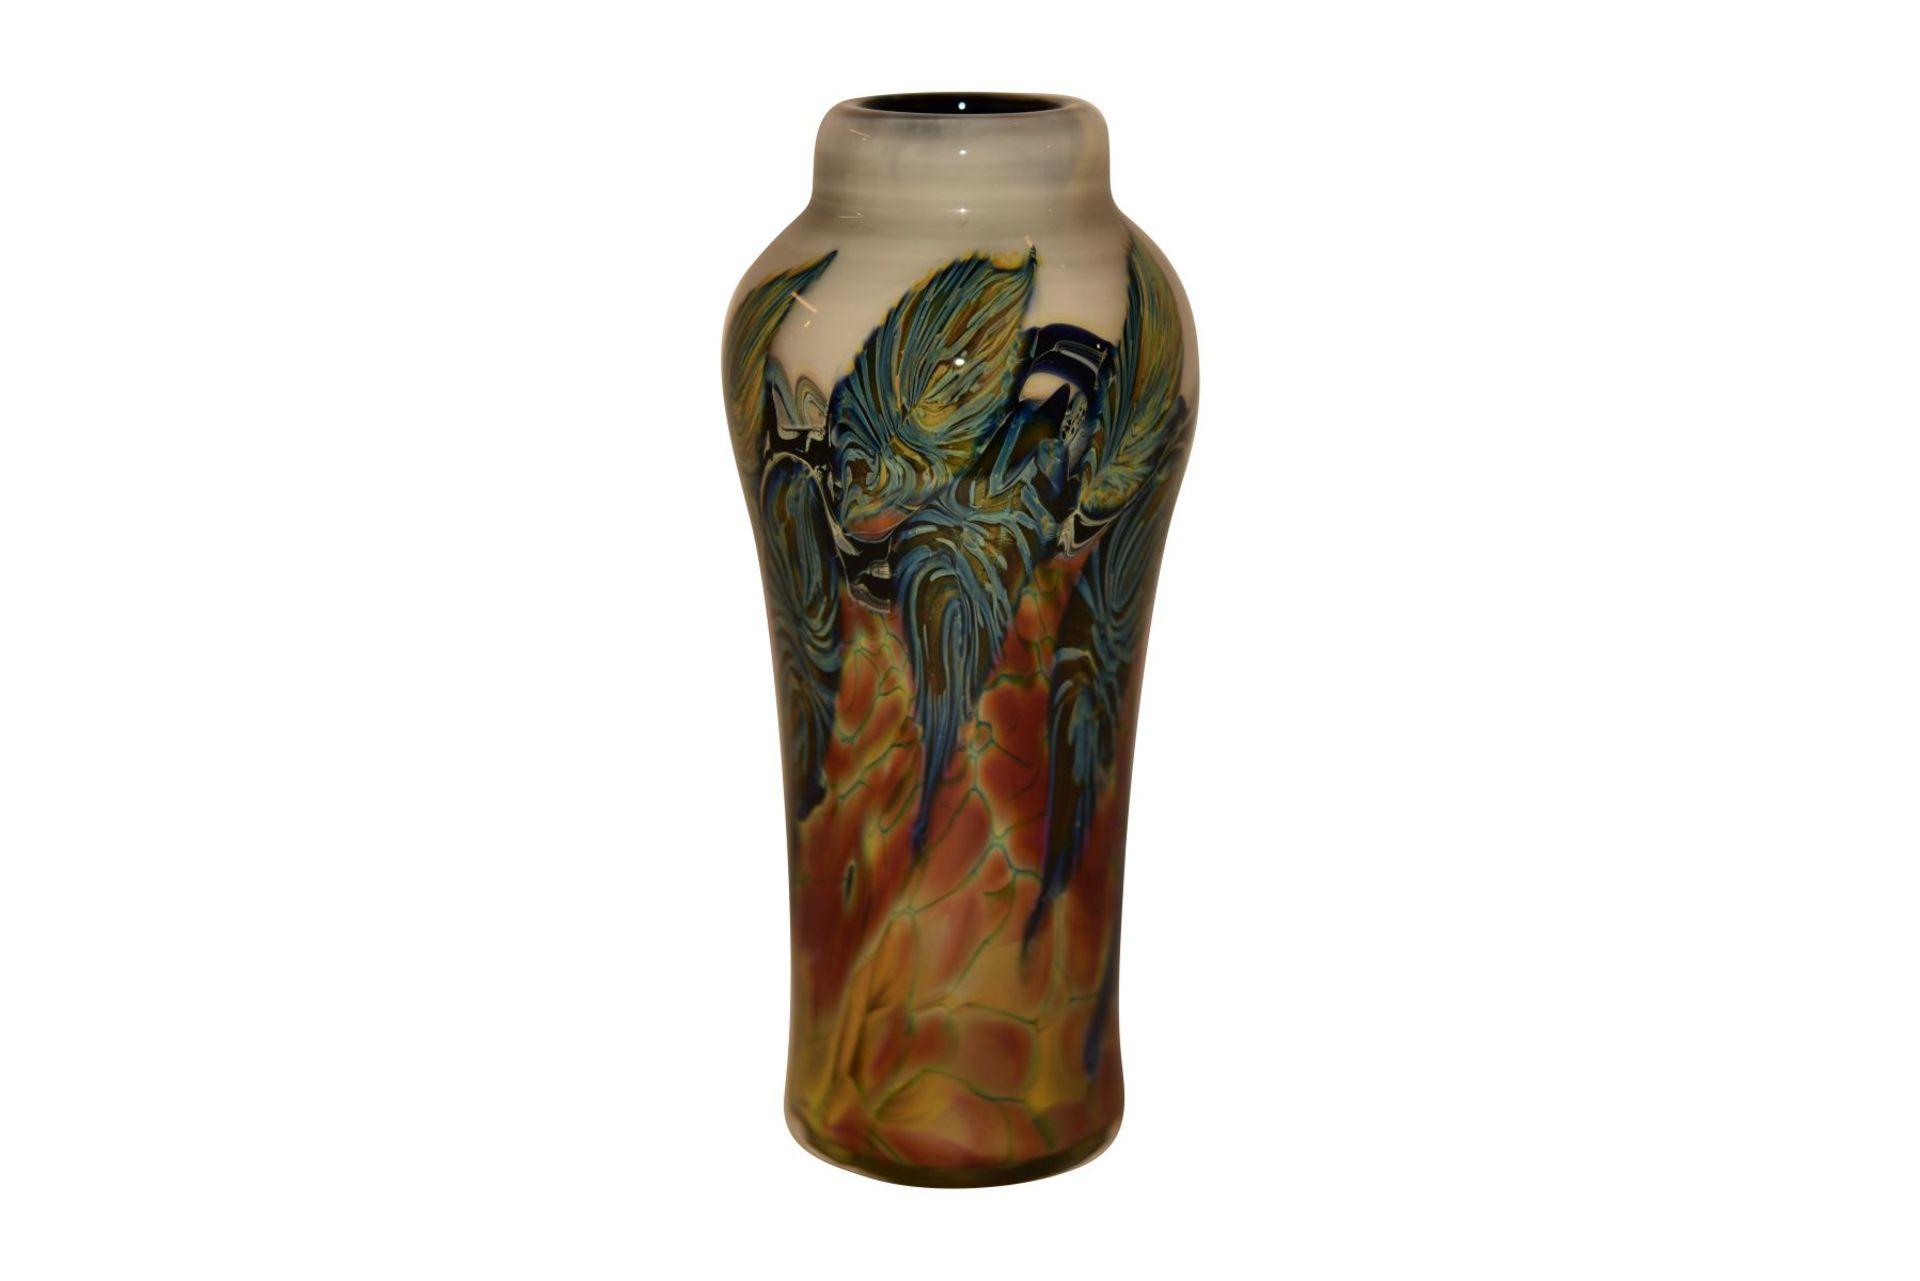 Seltene Vase - Bild 2 aus 2